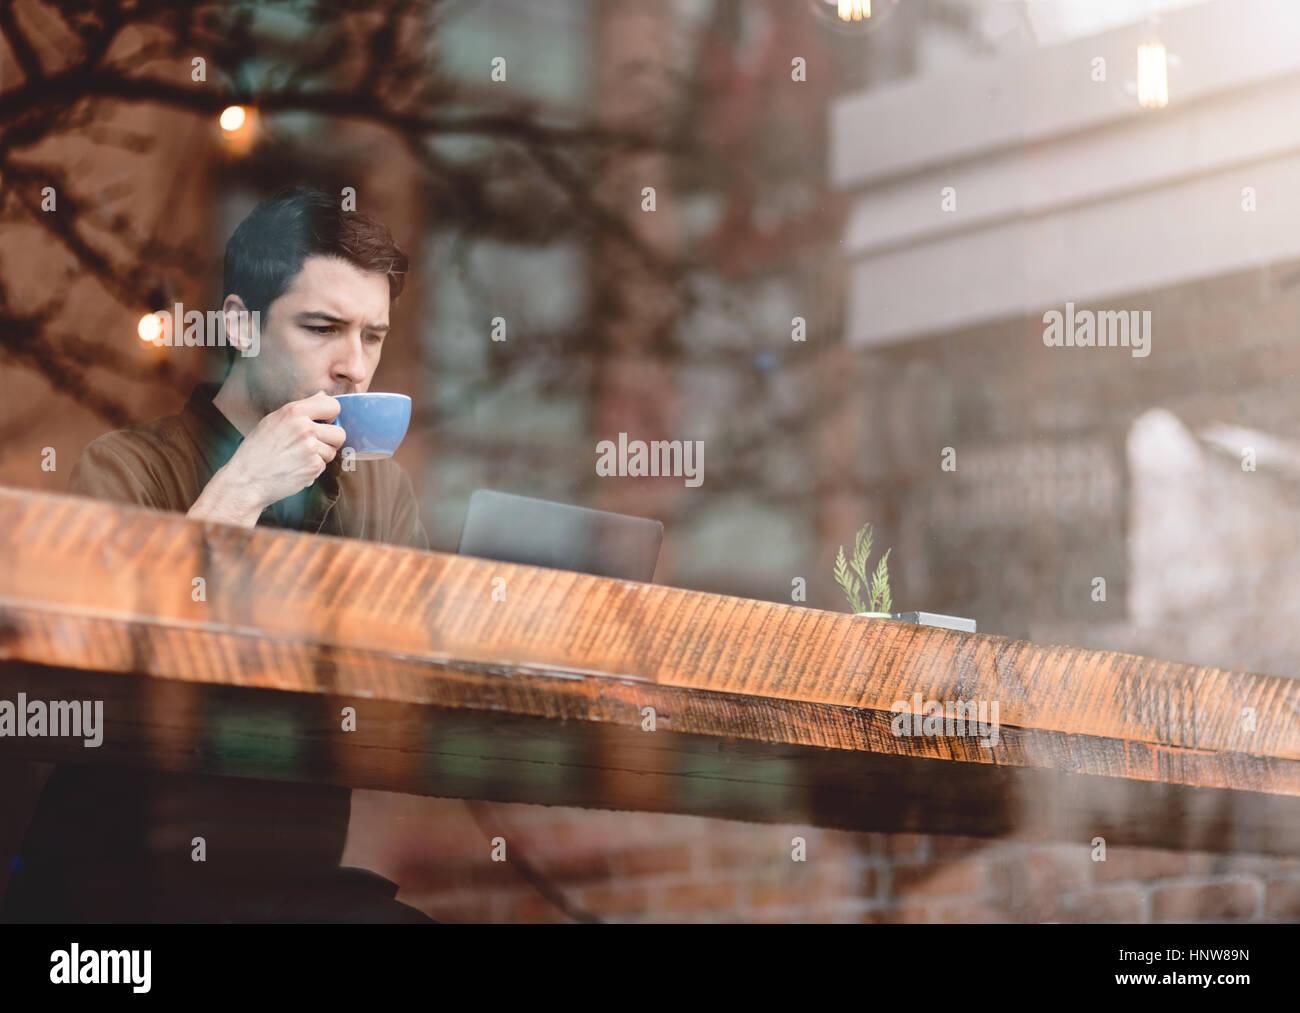 Man having coffee at cafe - Stock Image